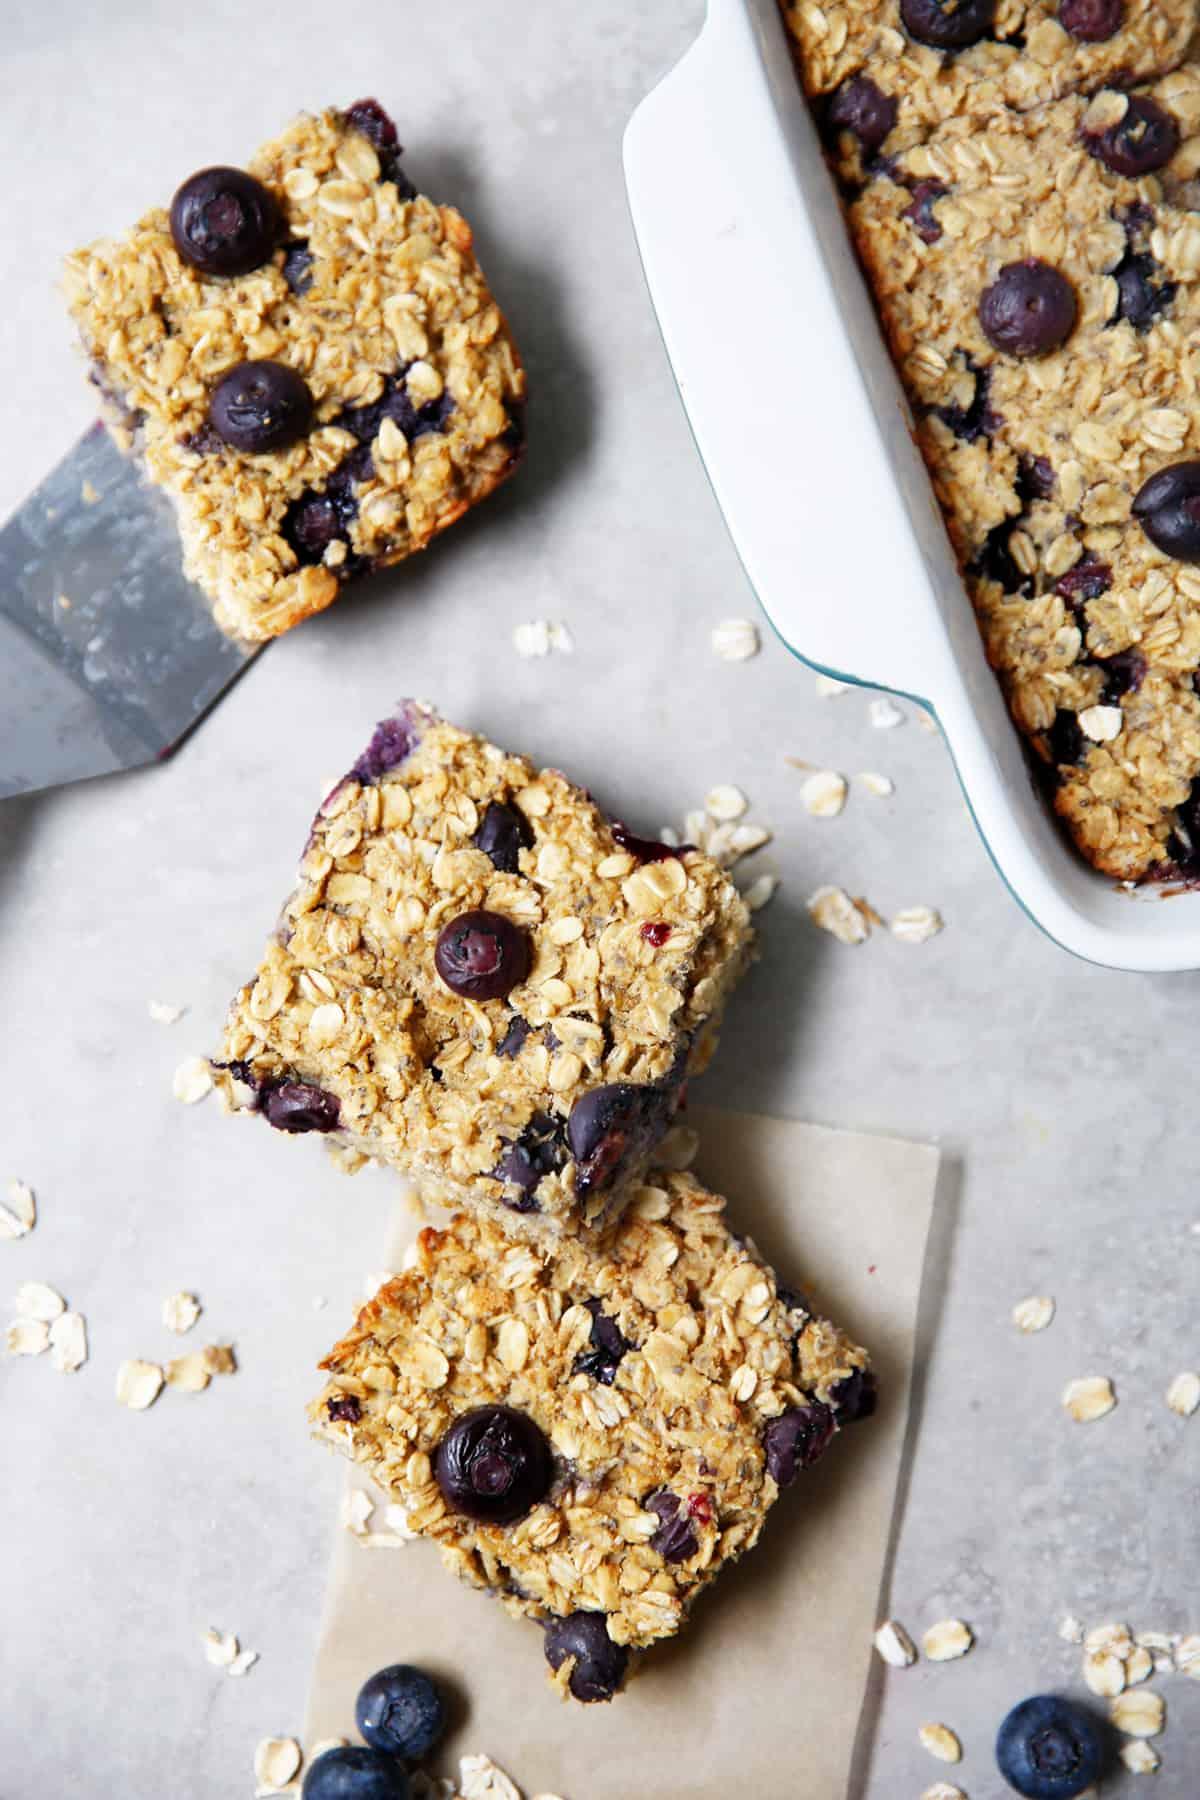 Make ahead baked oatmeal recipes